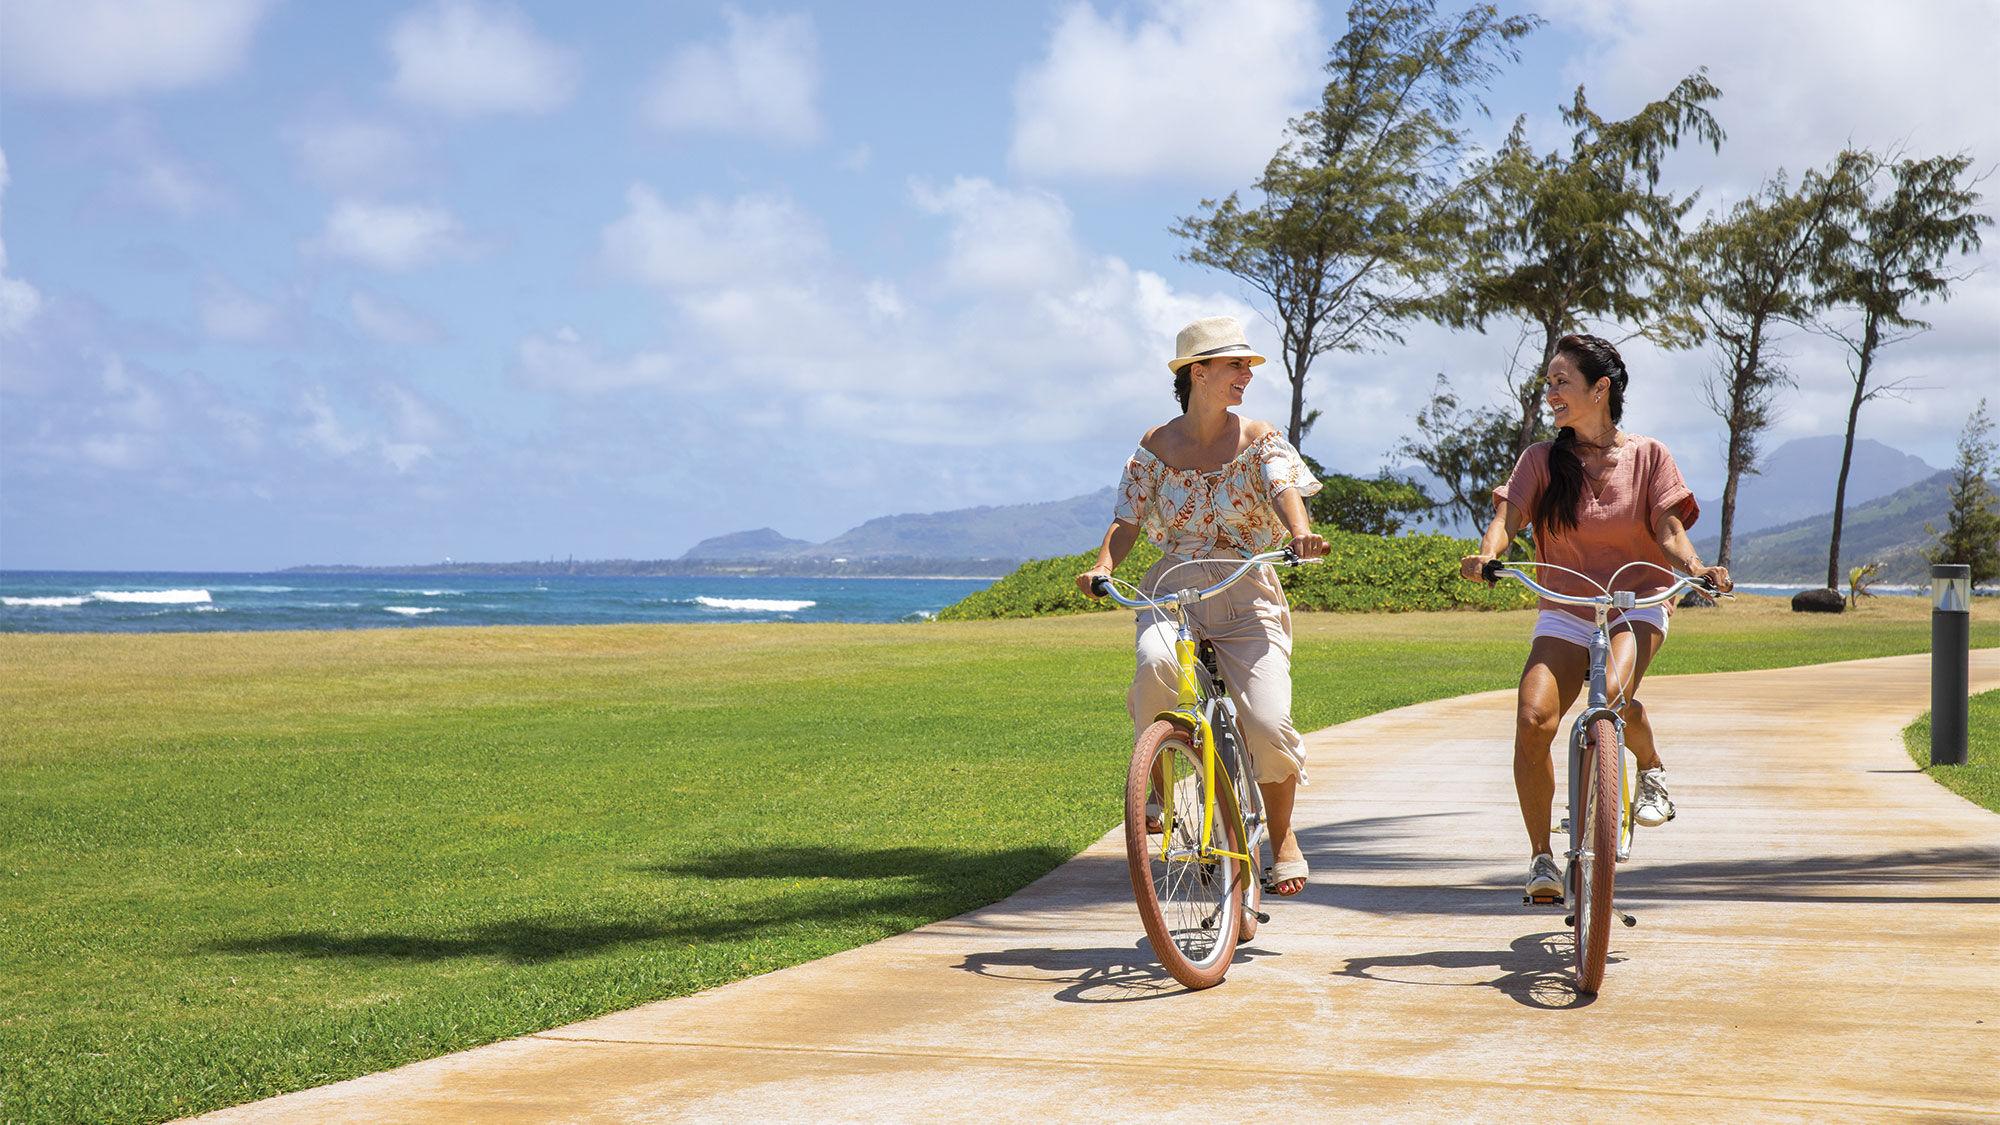 T0802SheratonKauaiBikes_C_HR [Credit: Courtesy of the Sheraton Kauai Coconut Beach Resort]